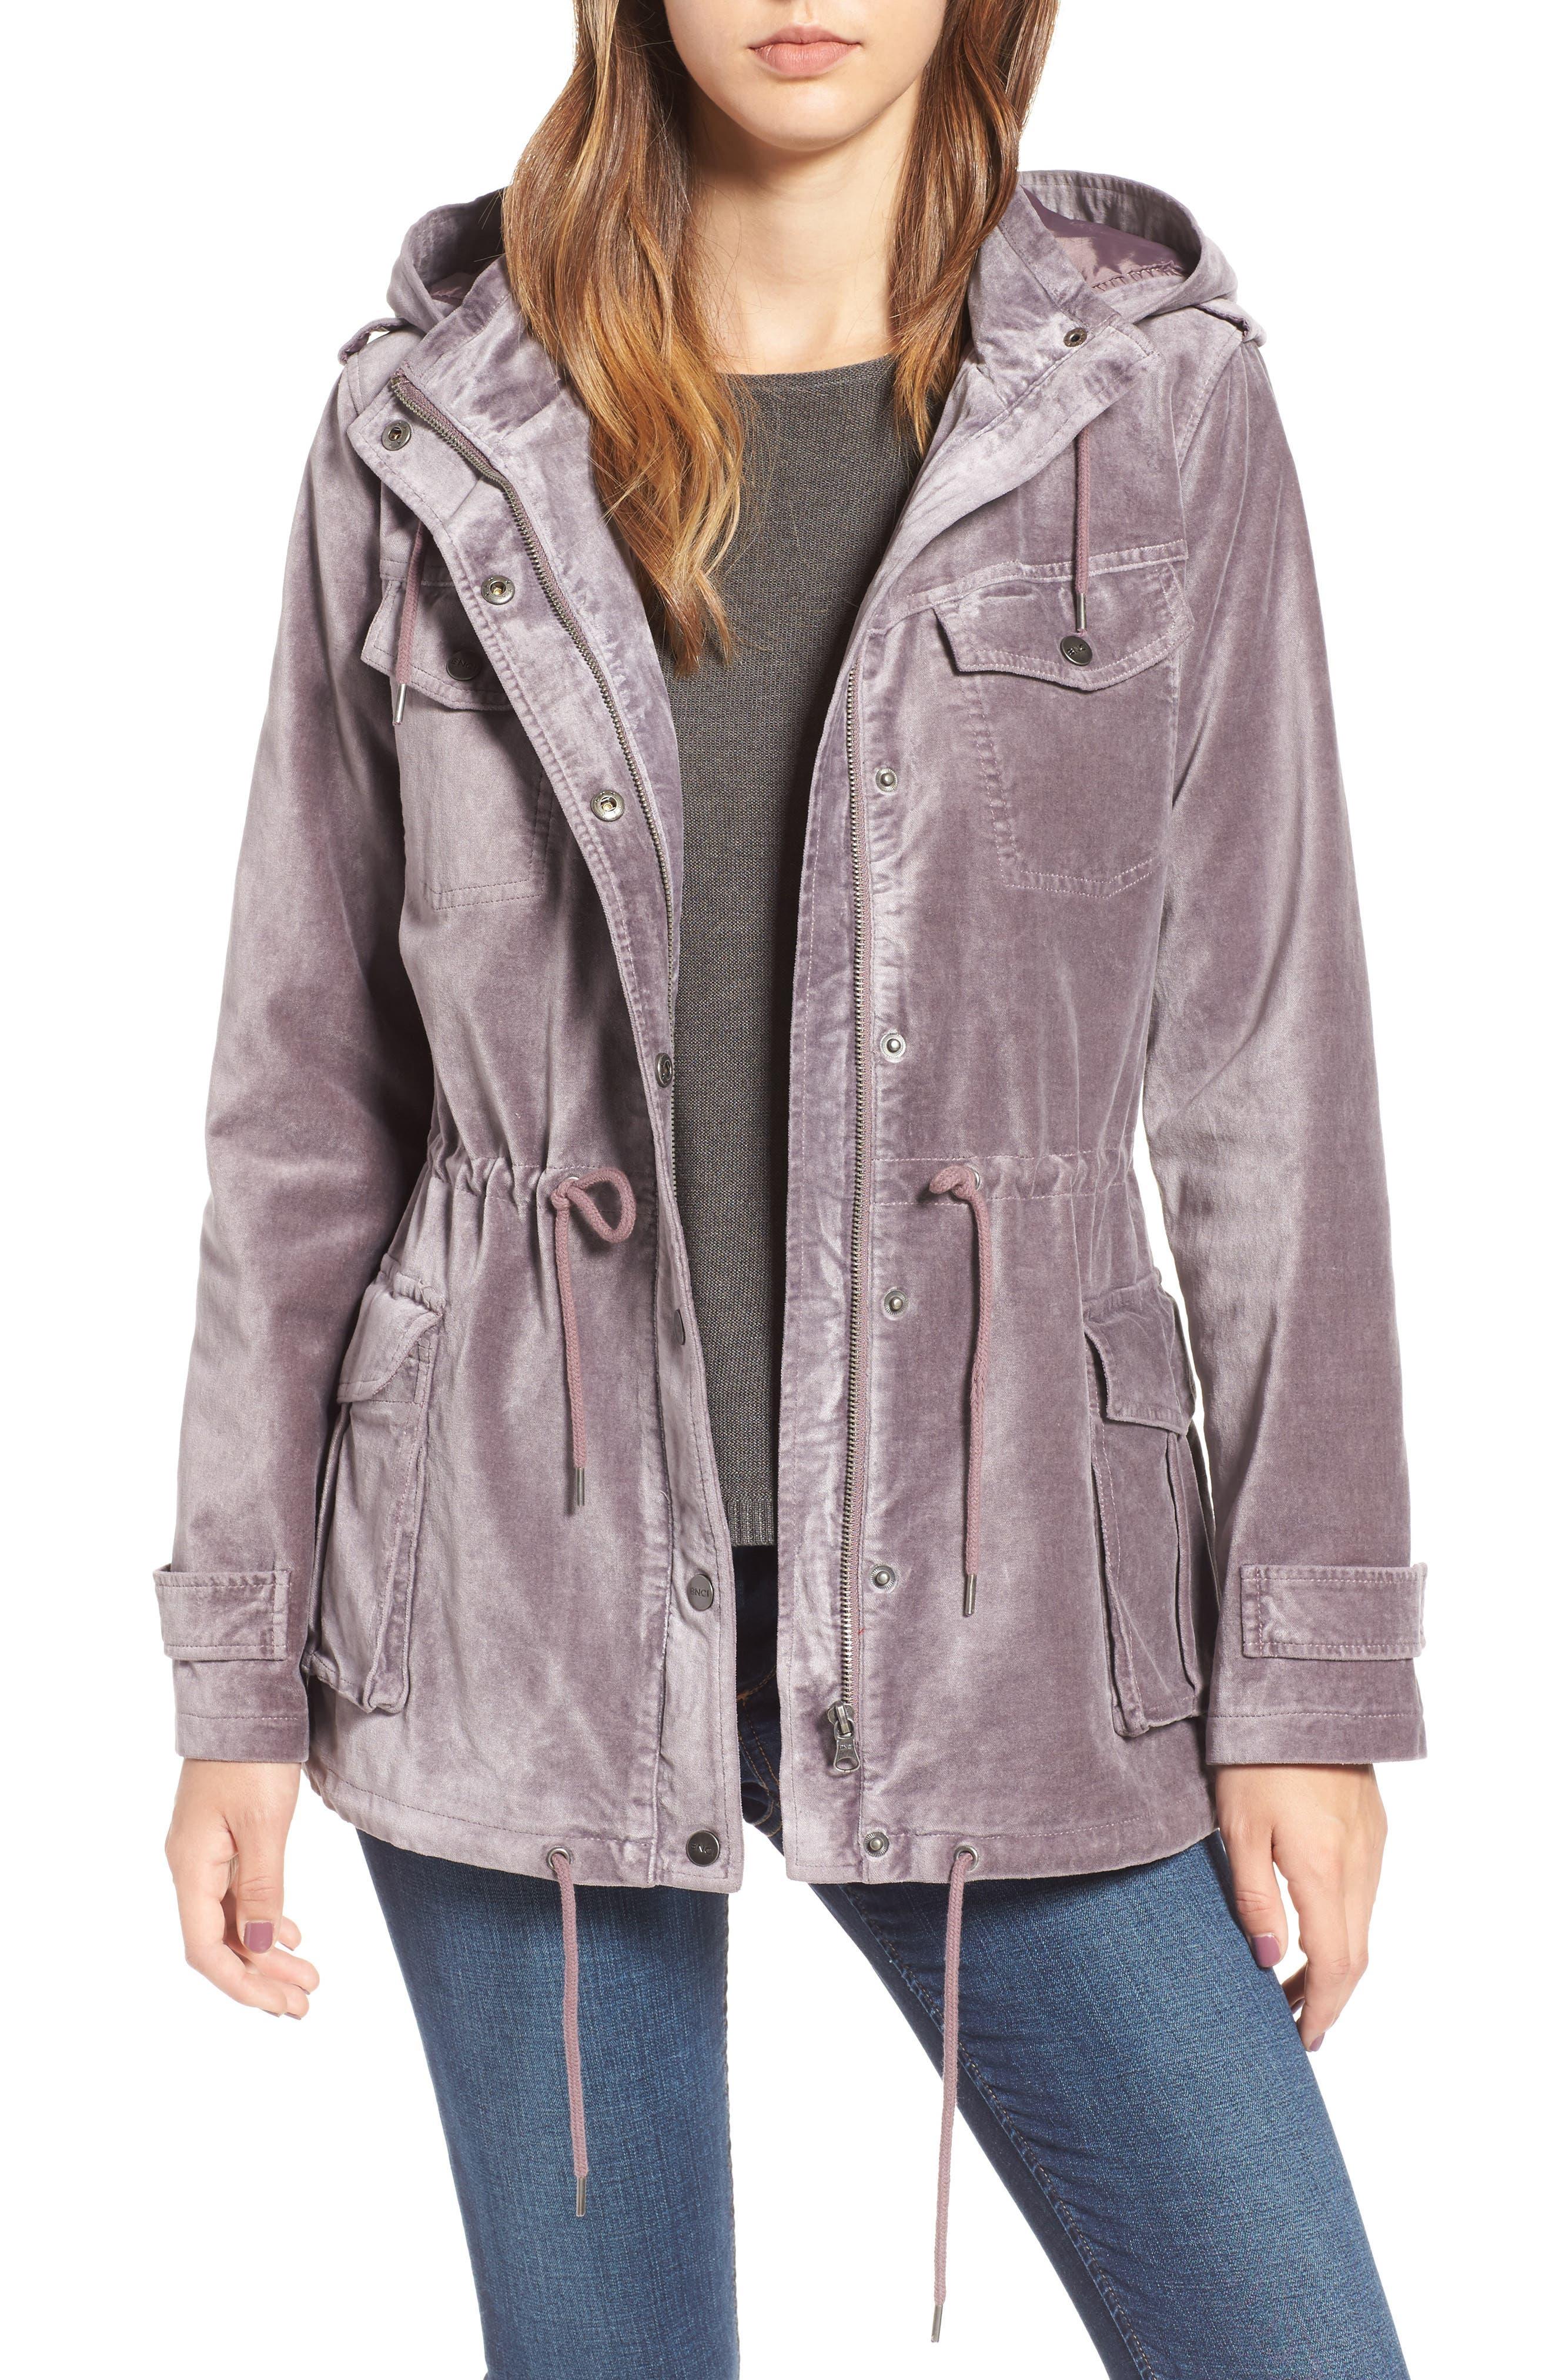 BNCI Cotton Velveteen Hooded Anorak Jacket,                             Main thumbnail 2, color,